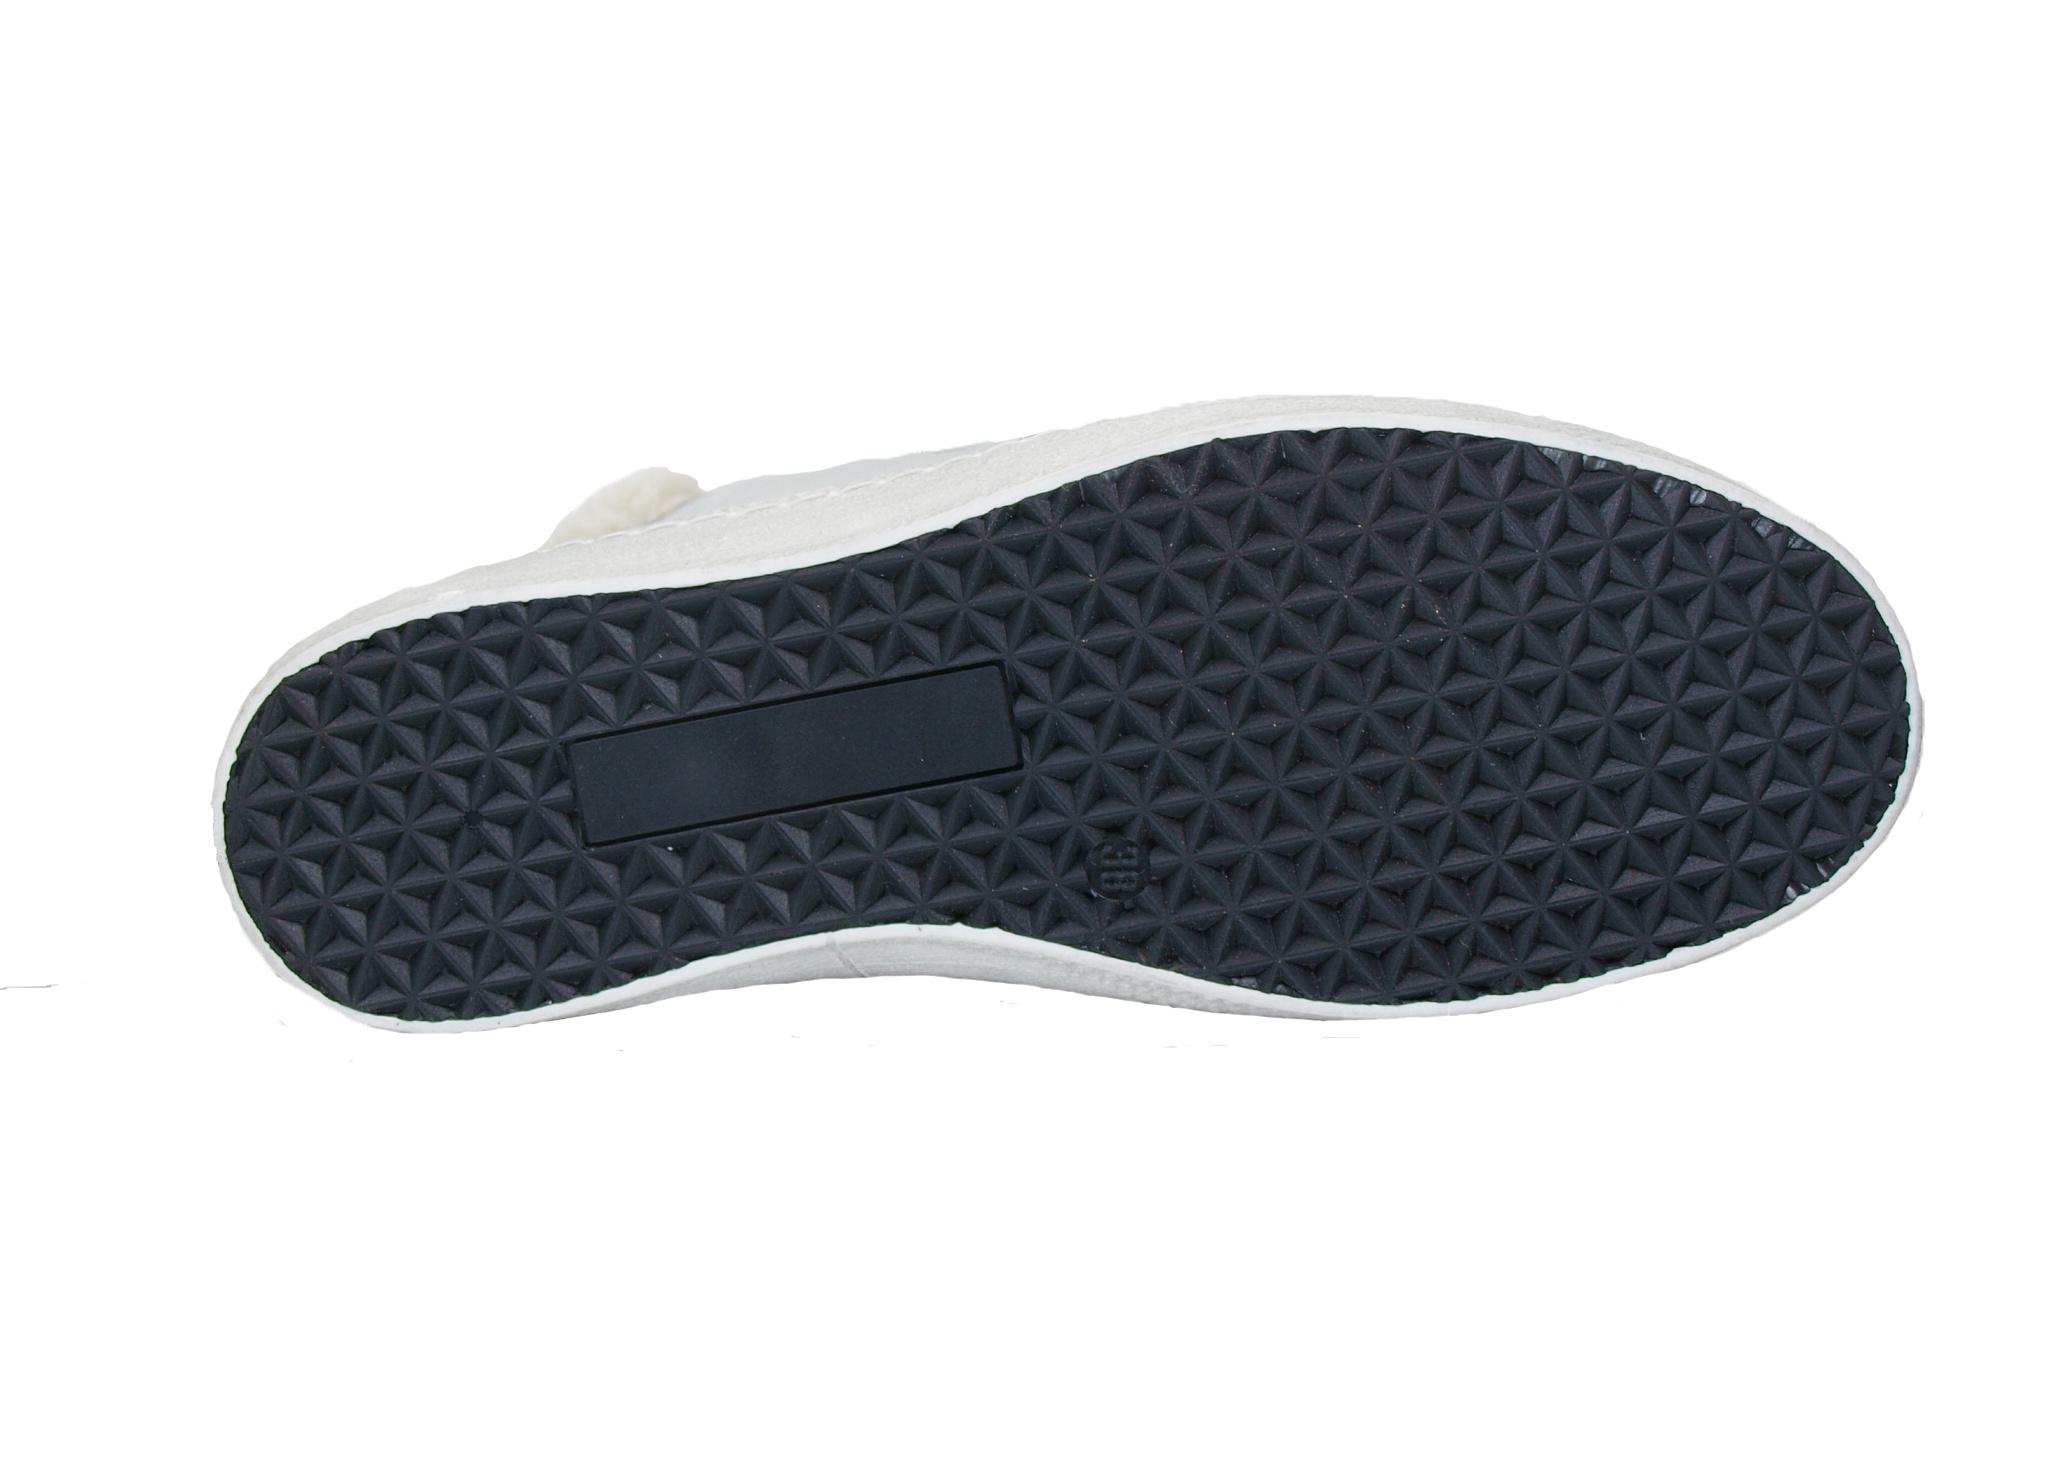 Toral Toral Sneaker Zilver 12736  Botin